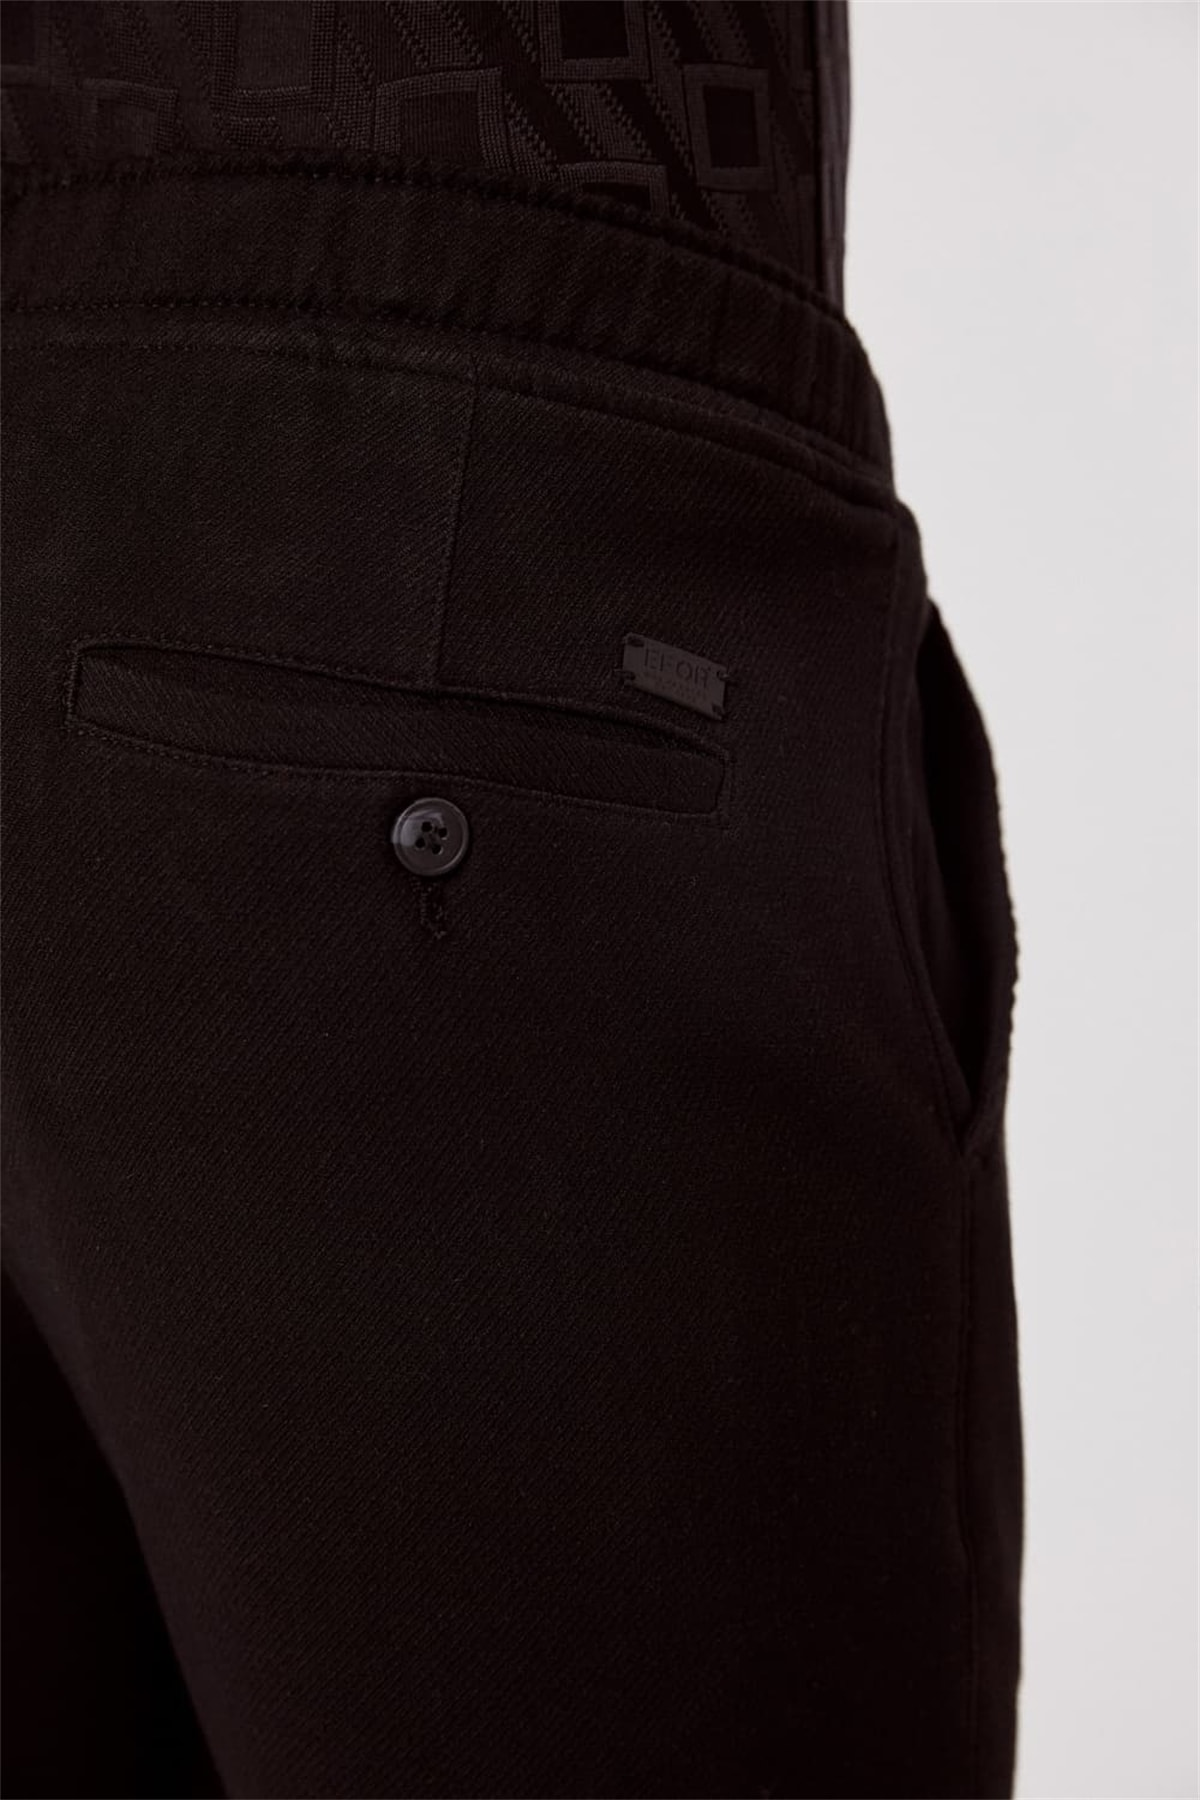 Efor ATP 017 Slim Fit Siyah Spor Pantolon 3